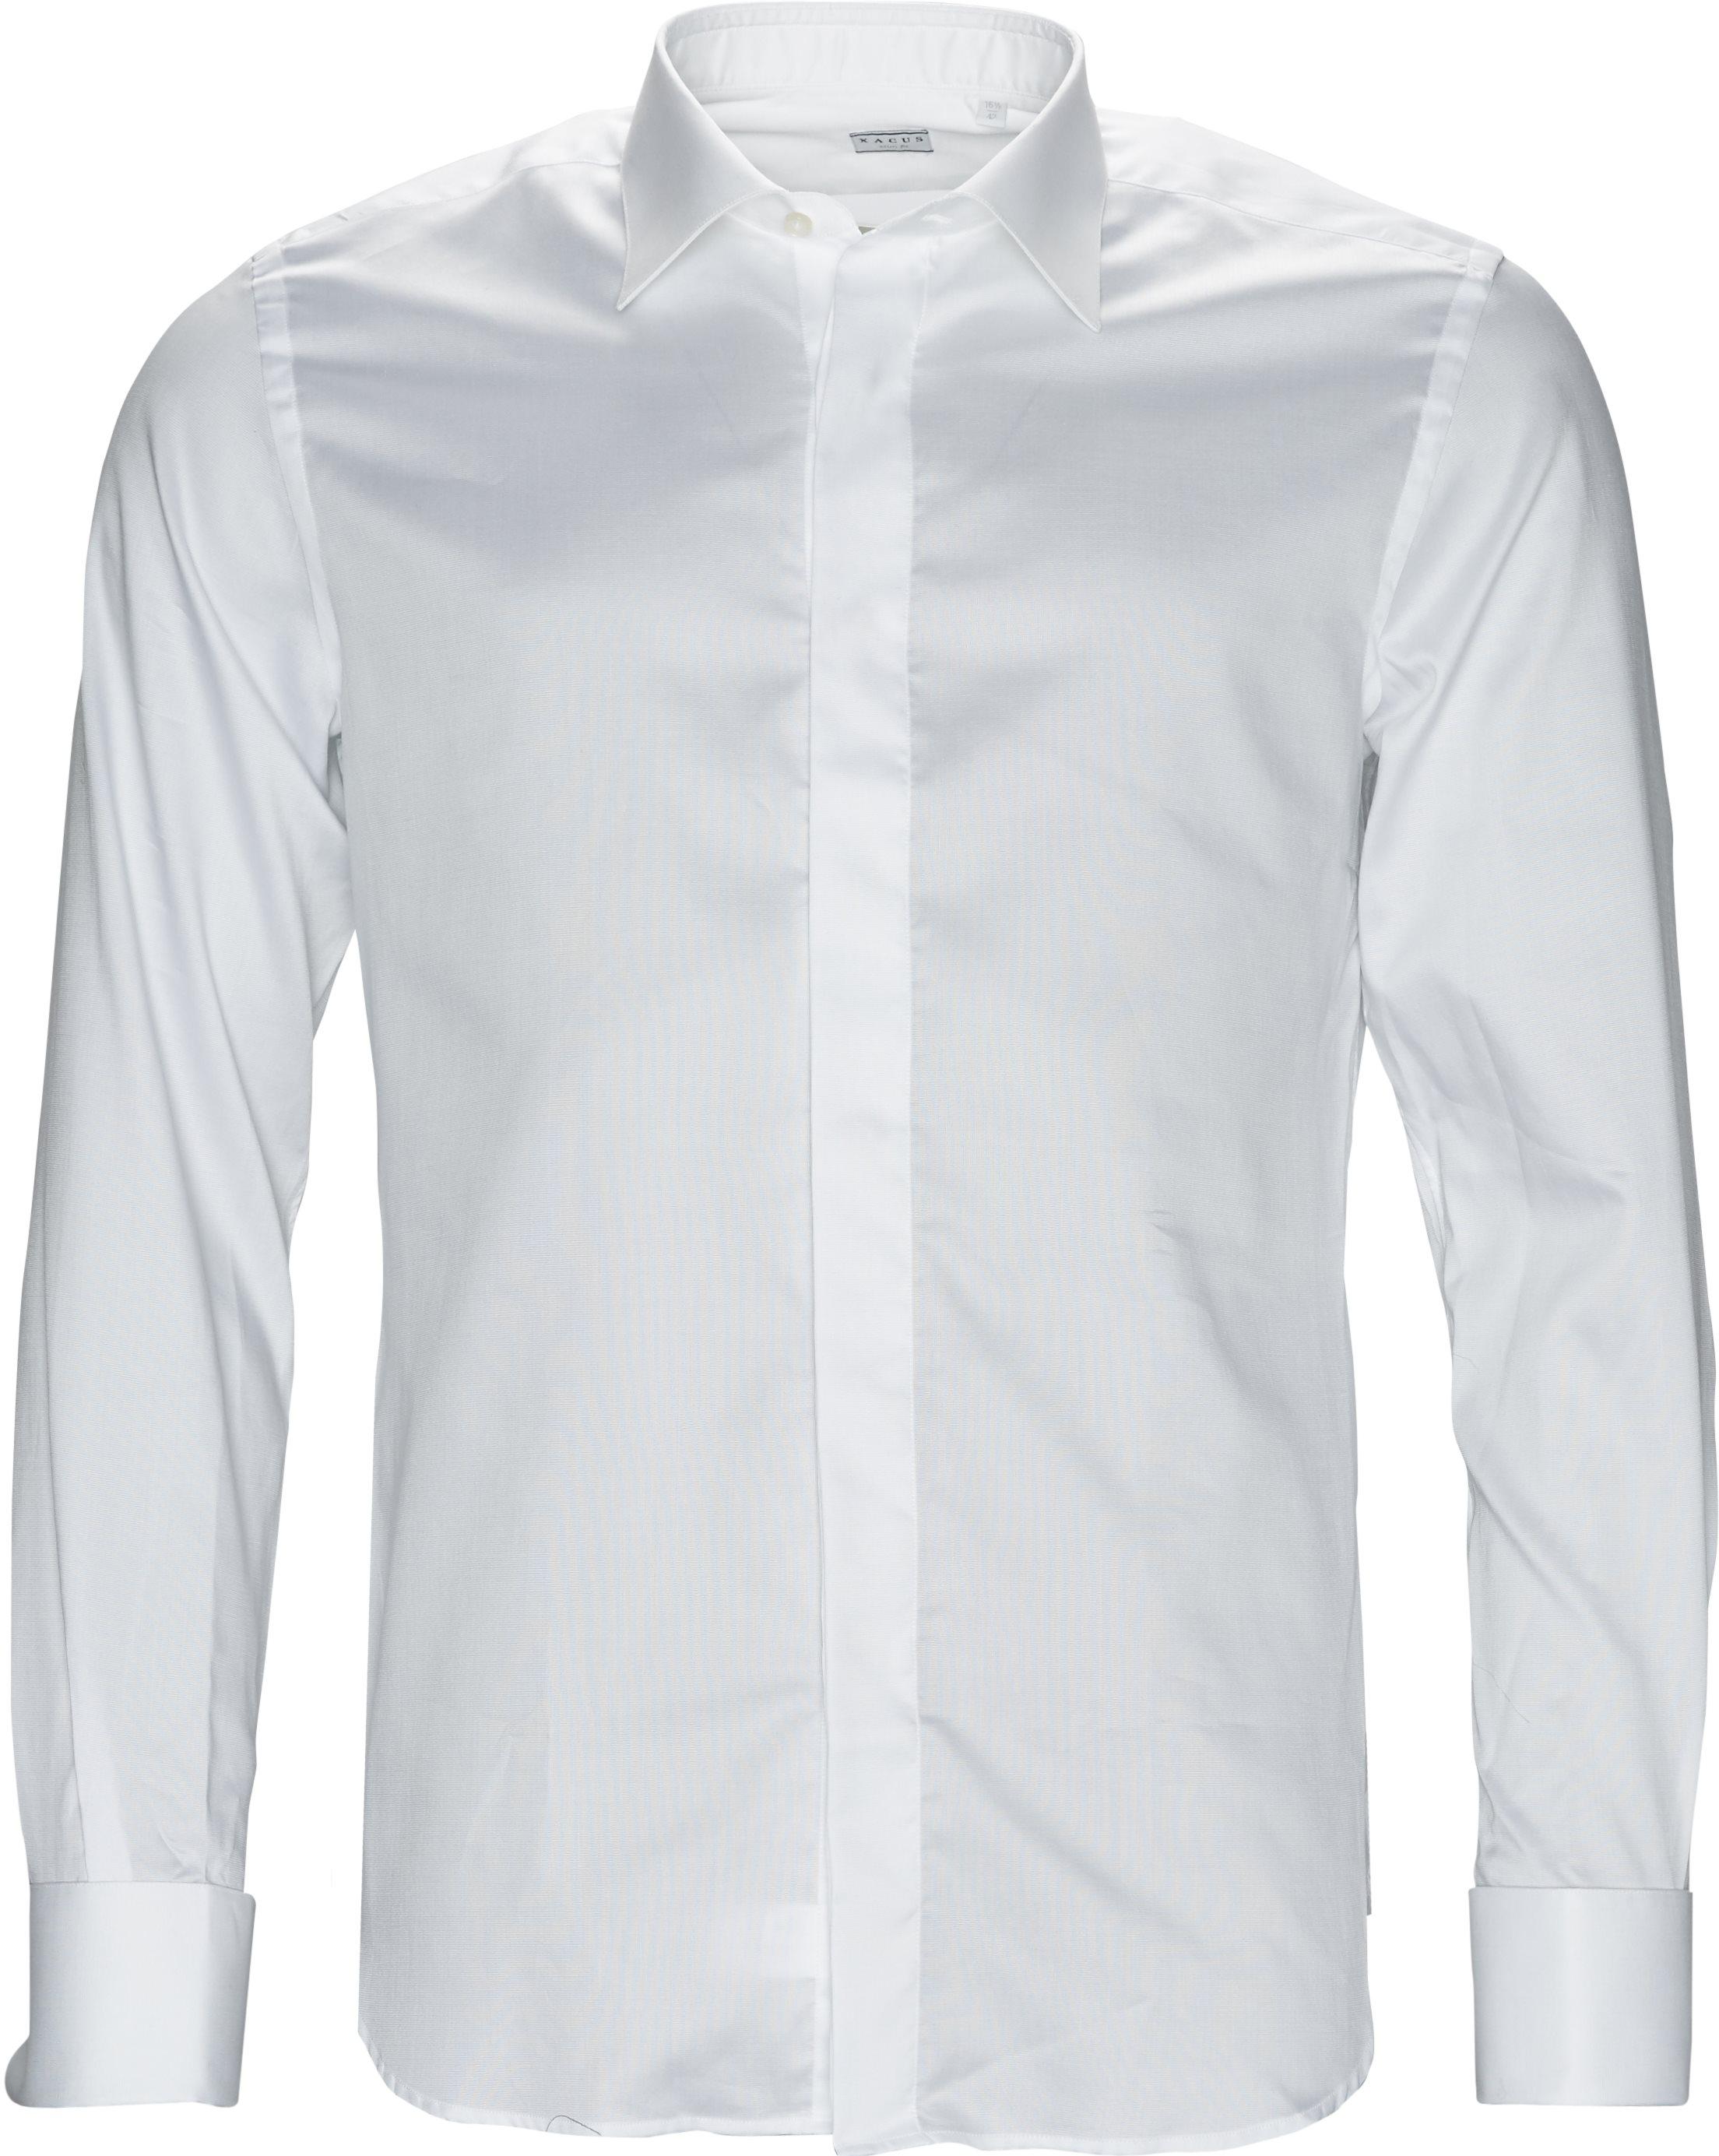 Shirts - Slim fit - White